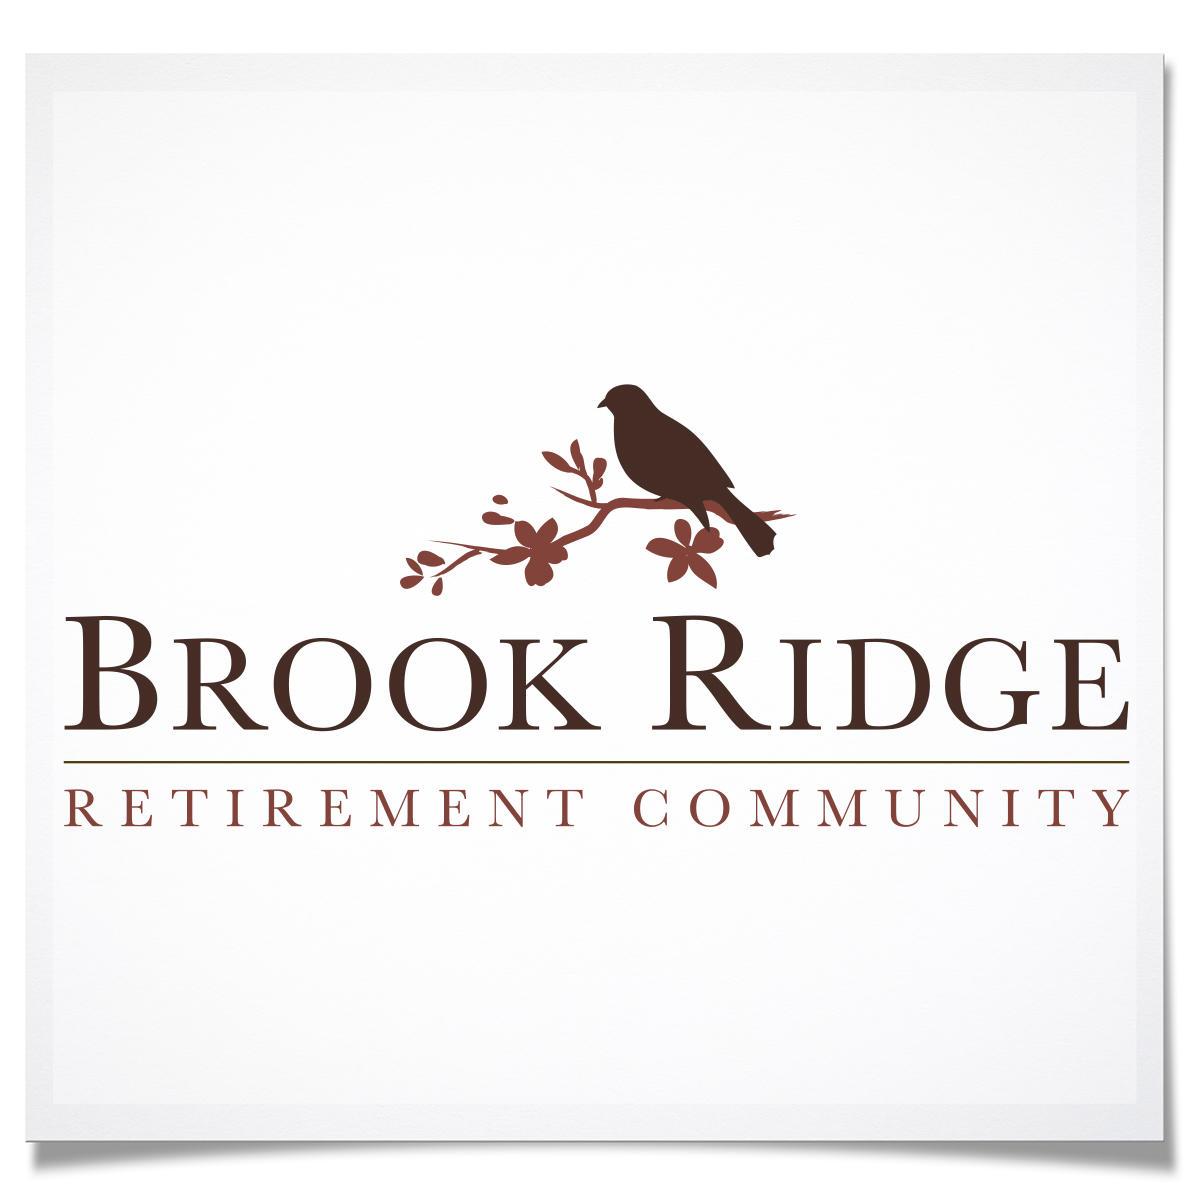 Brook Ridge Retirement Community